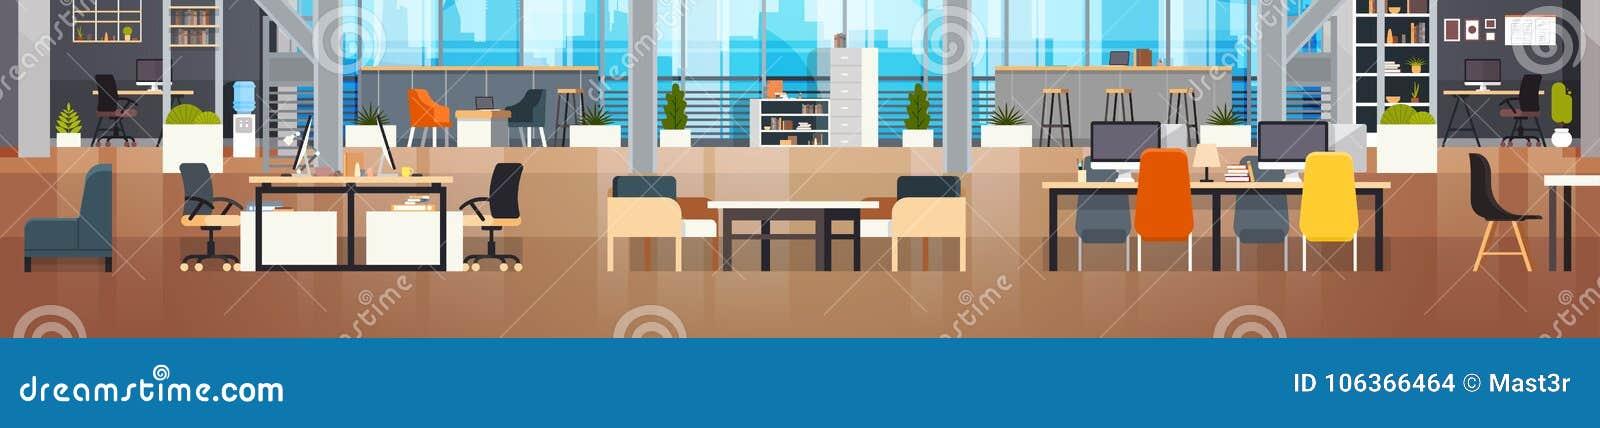 Coworking办公室内部现代Coworking中心创造性的工作场所环境水平的横幅